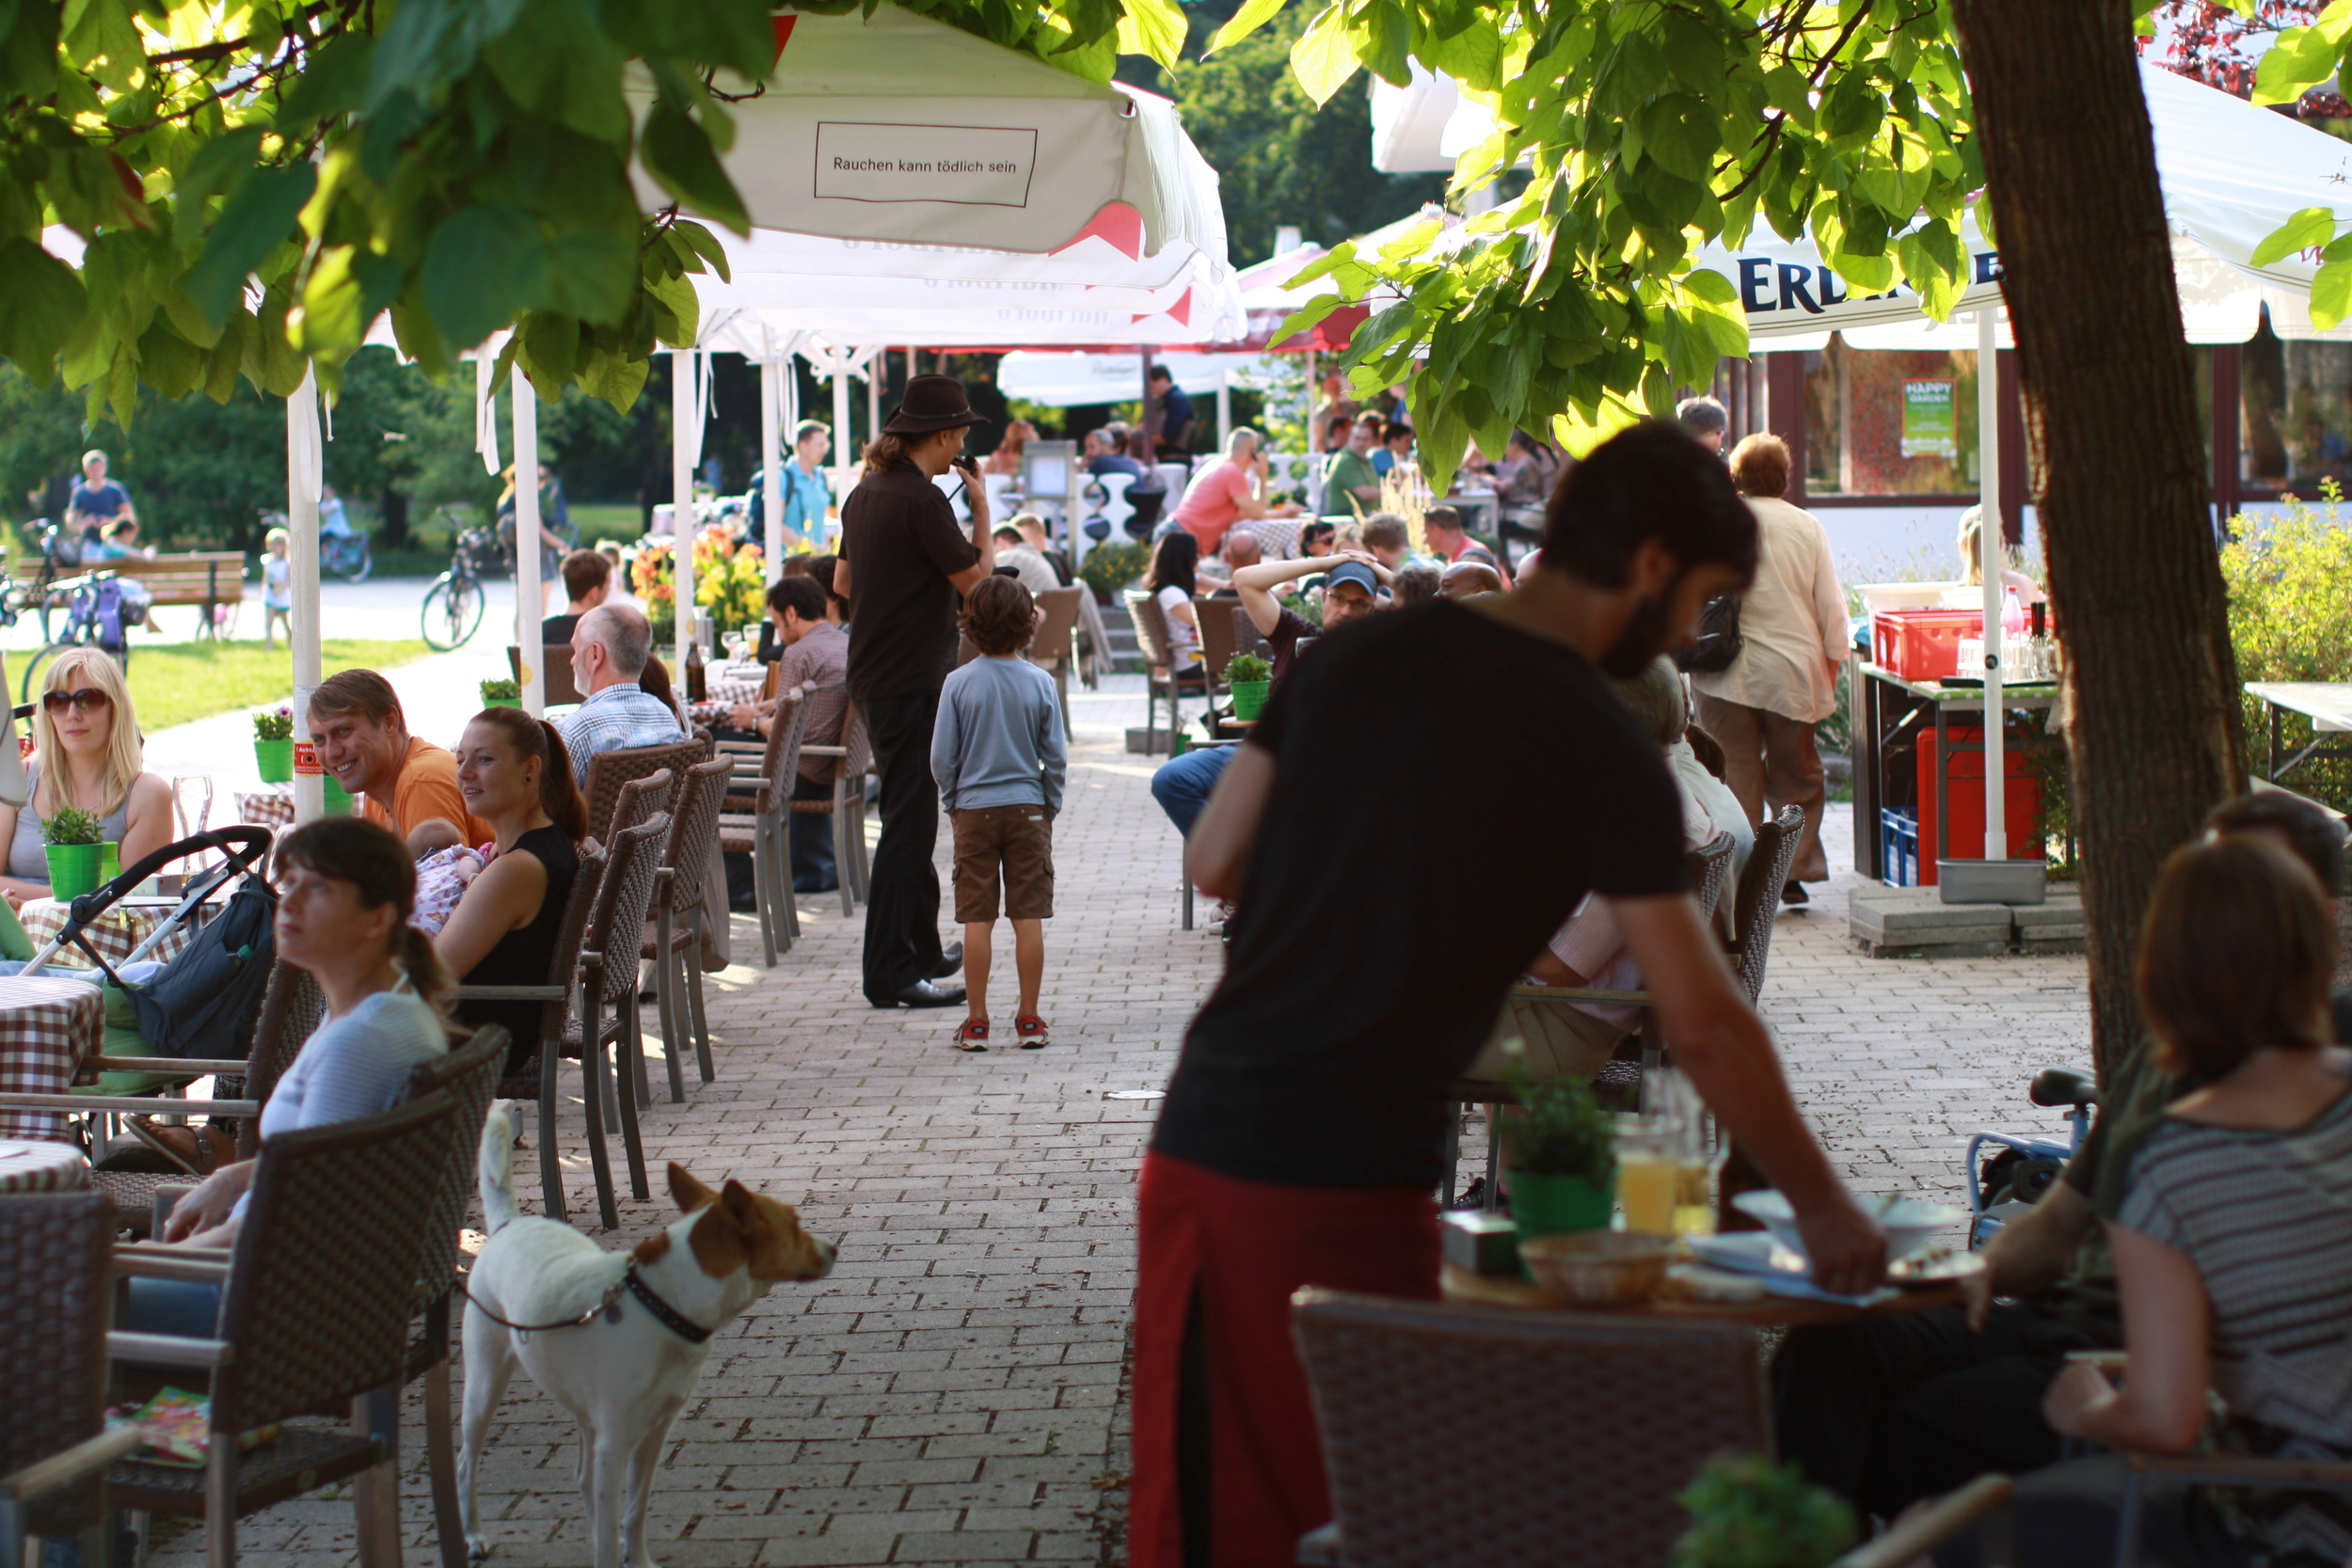 Copy of Restaurant Schoenbrunn   Volkspark Friedrichshain, Berlin